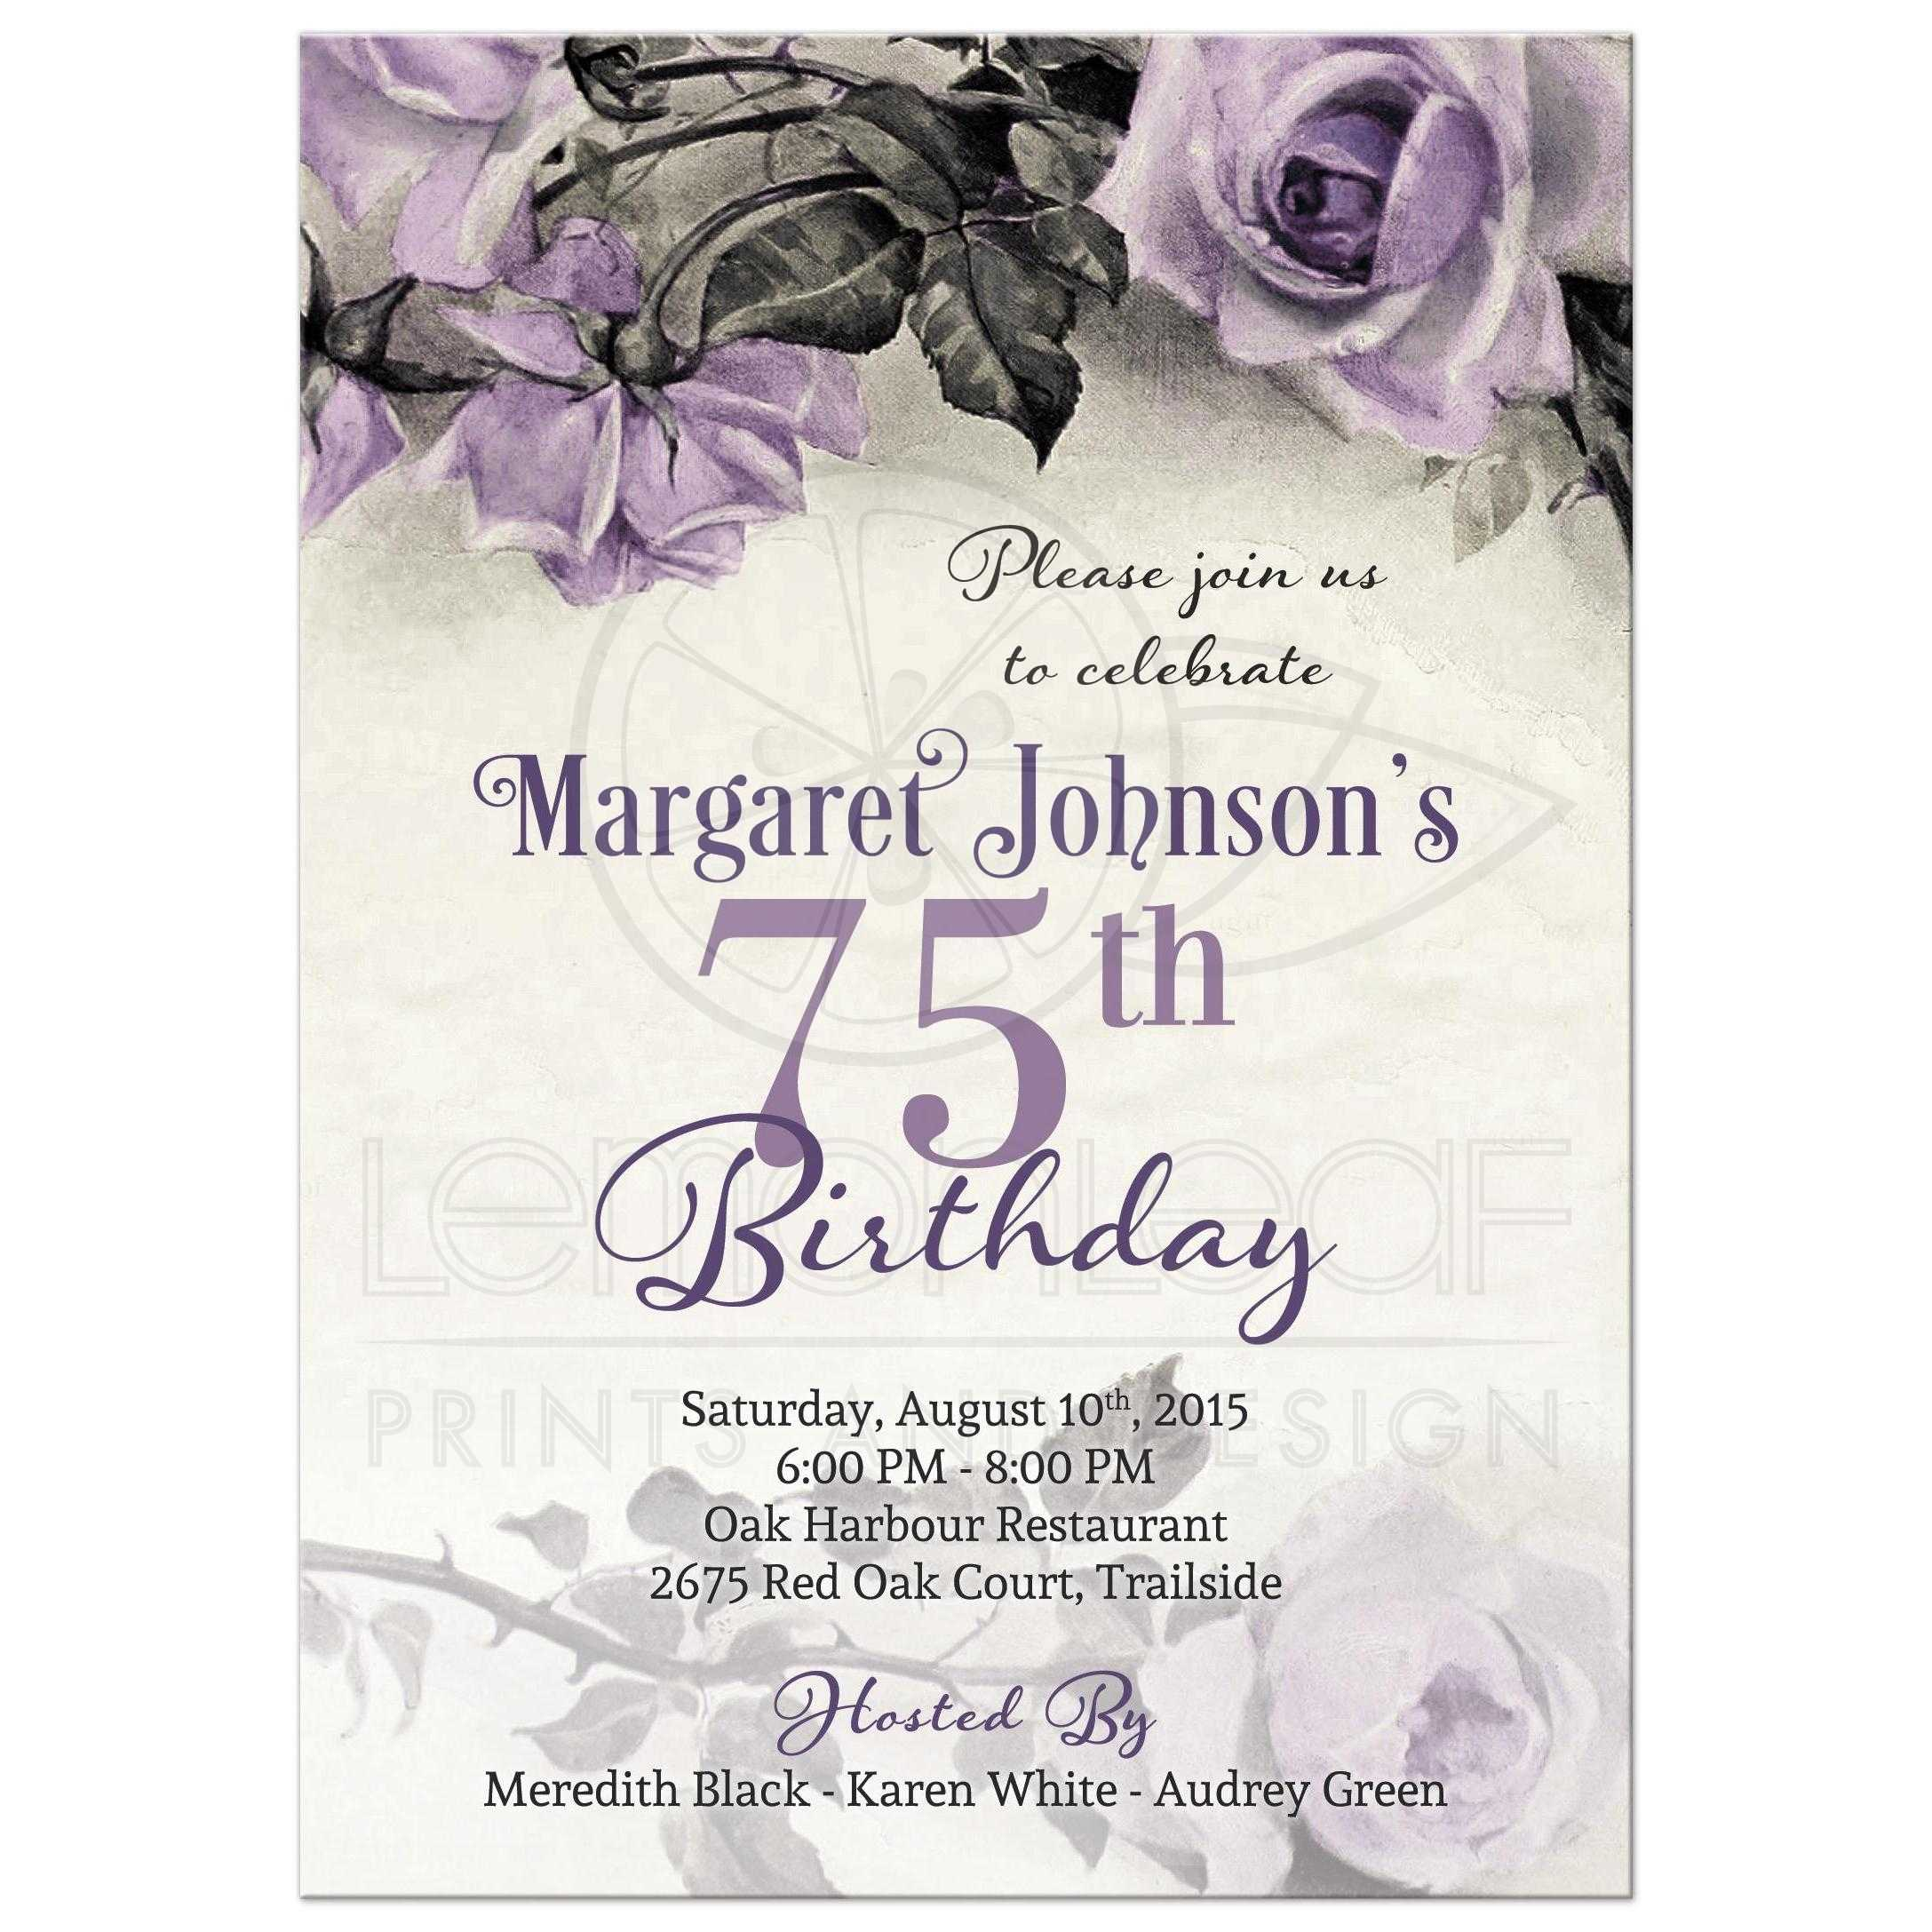 75th birthday invitation vintage purple sterling silver rose